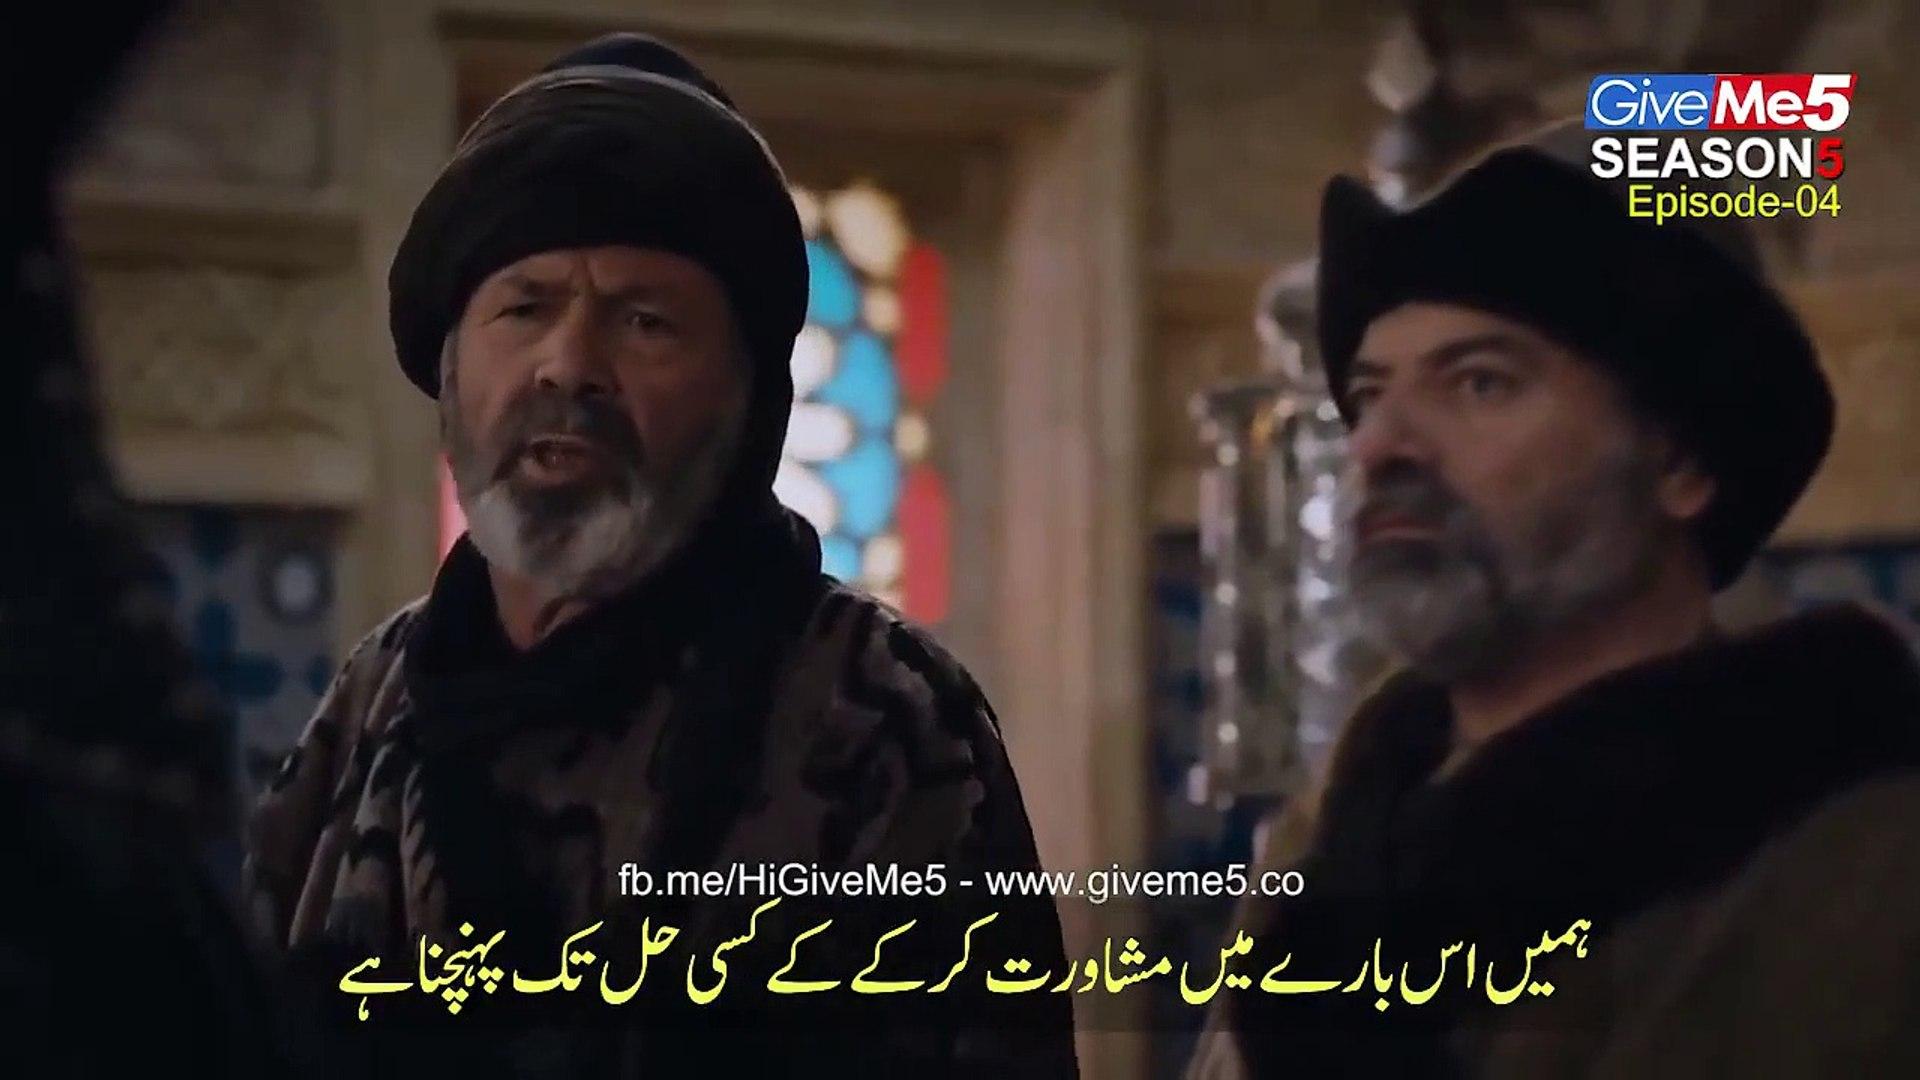 Dirilis Ertugrul Ghazi Season 5 in Urdu Subtitle Episode 3 & 4